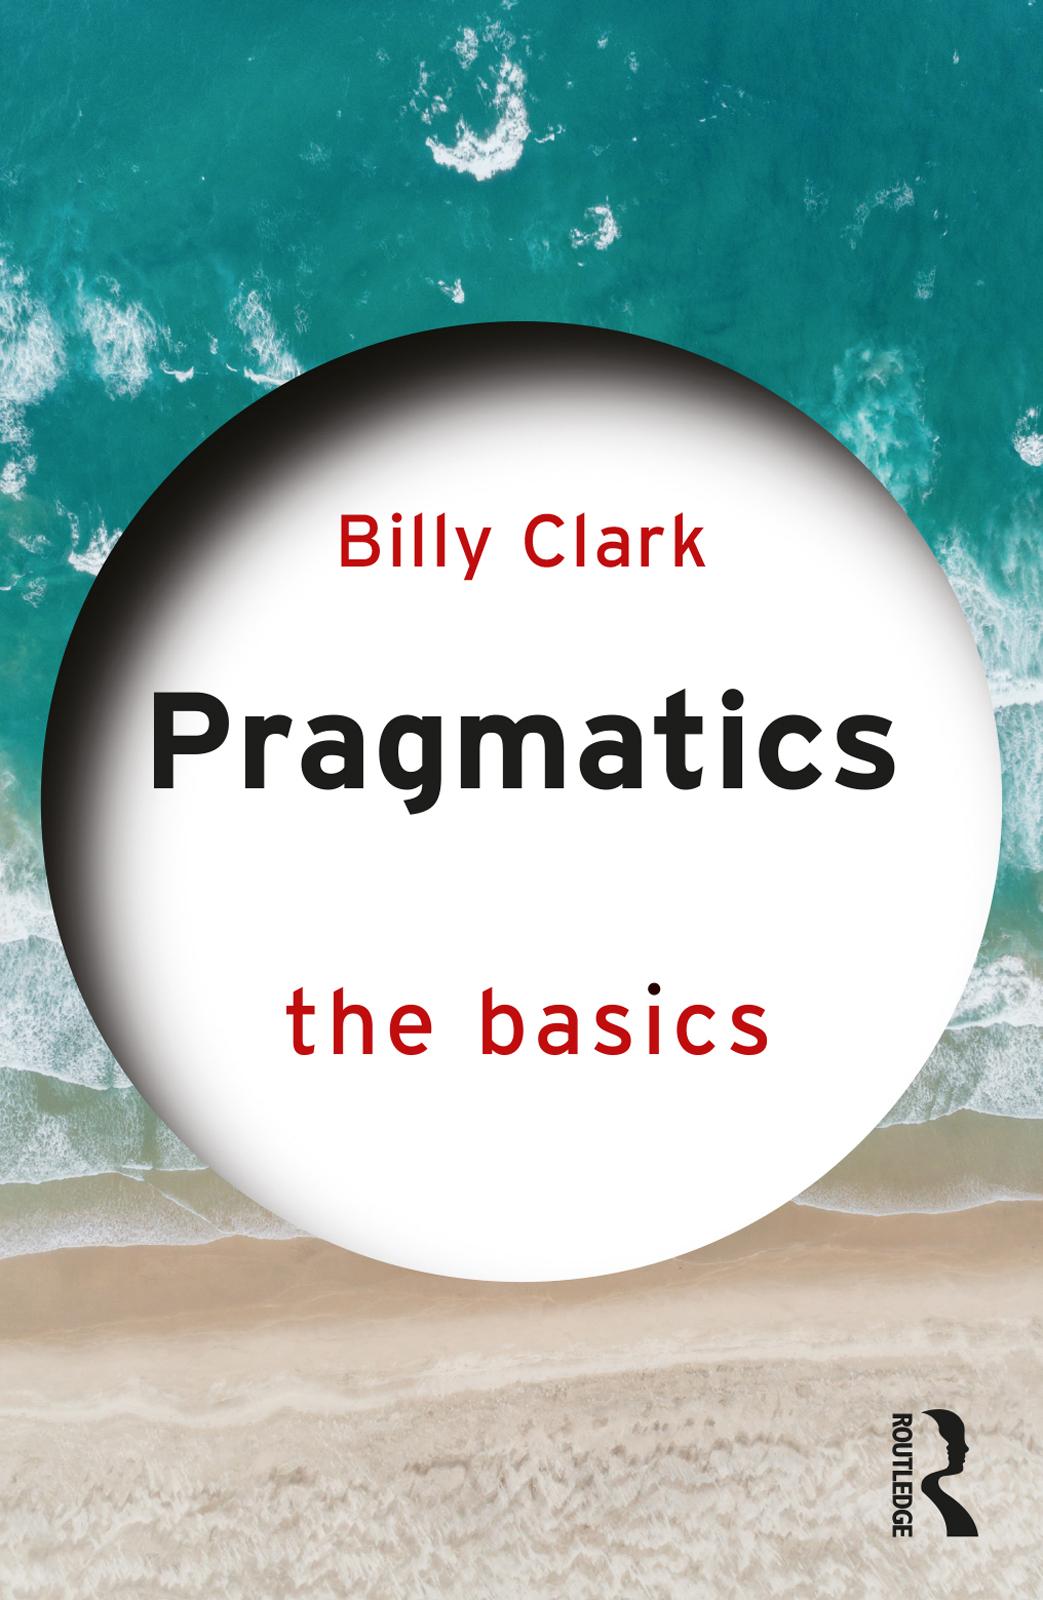 Principles and Heuristics